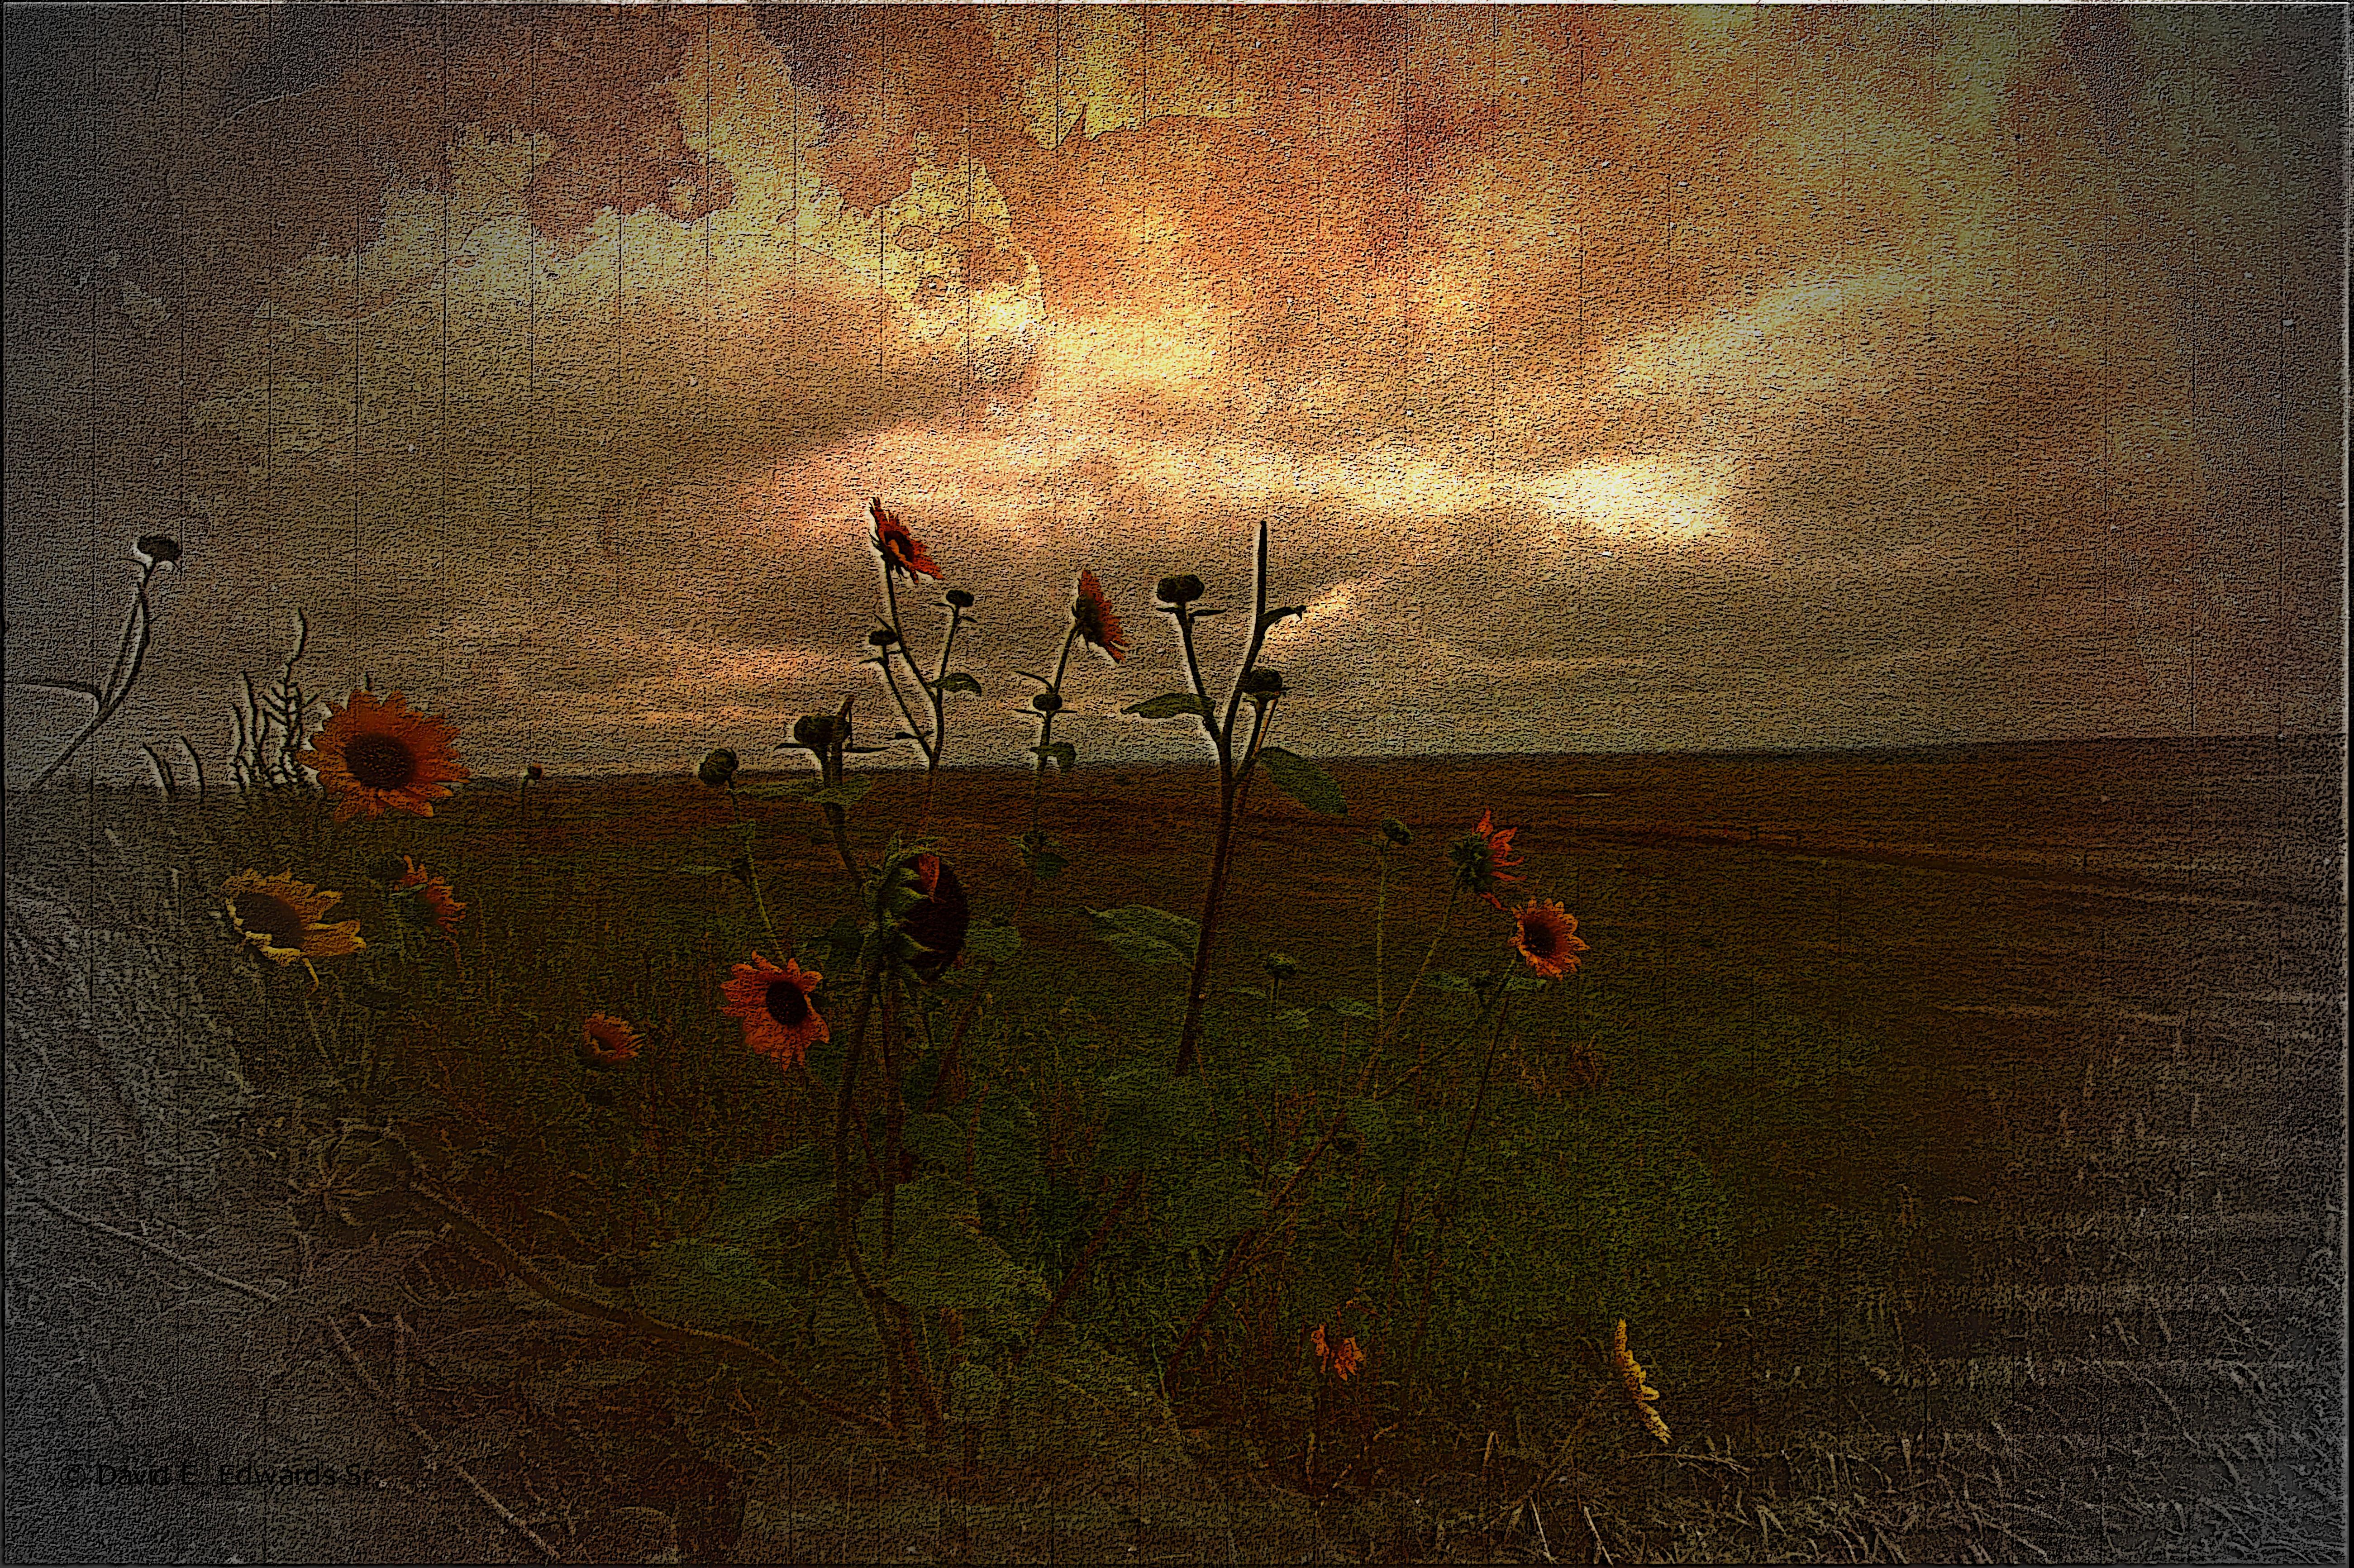 Prairie flowers along the way...